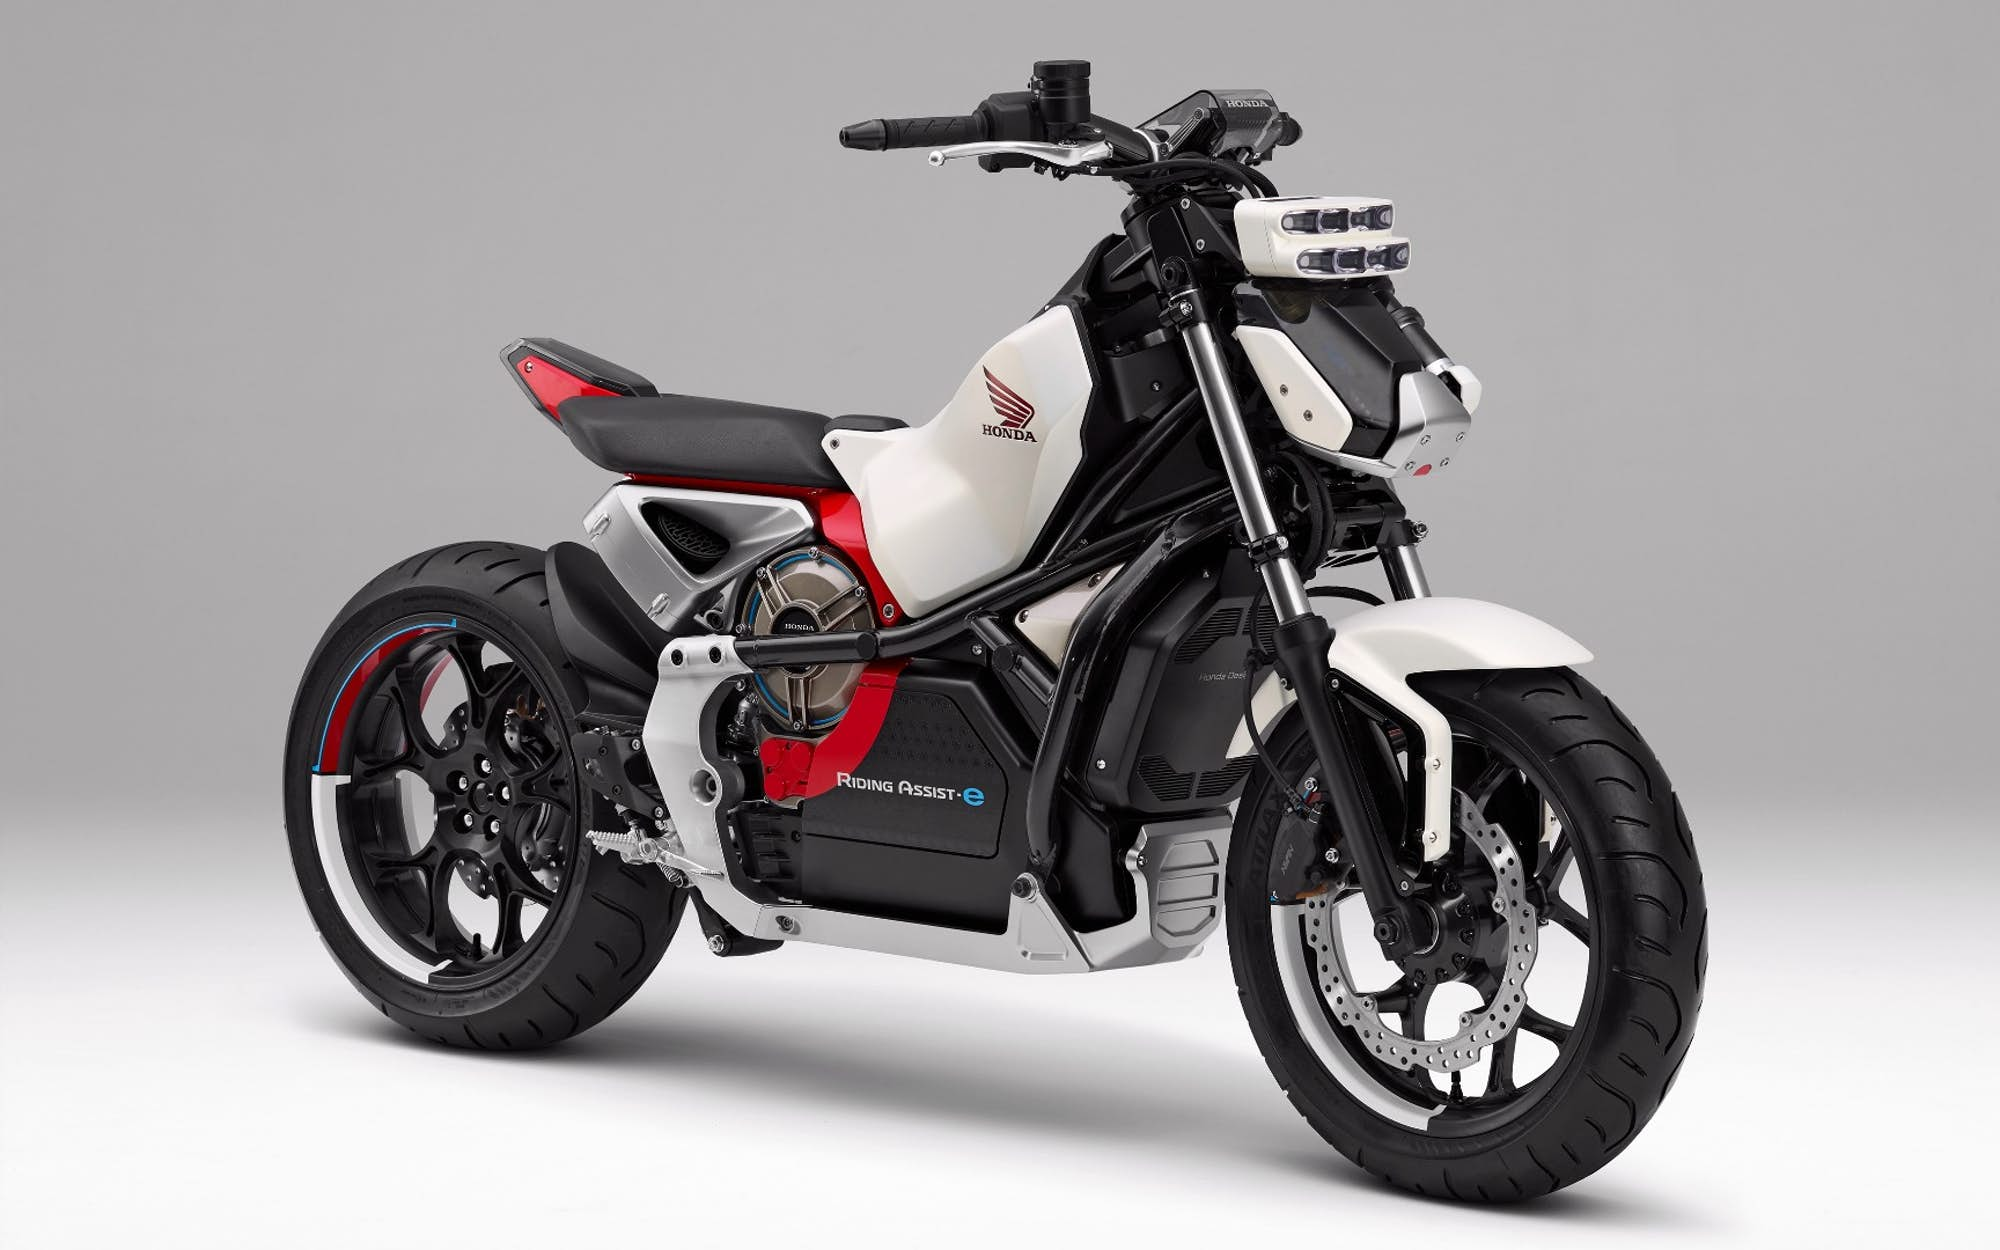 Uber Vehicle List >> Honda introduces 'Riding Assist-e' self-balancing electric motorcycle - Electrek